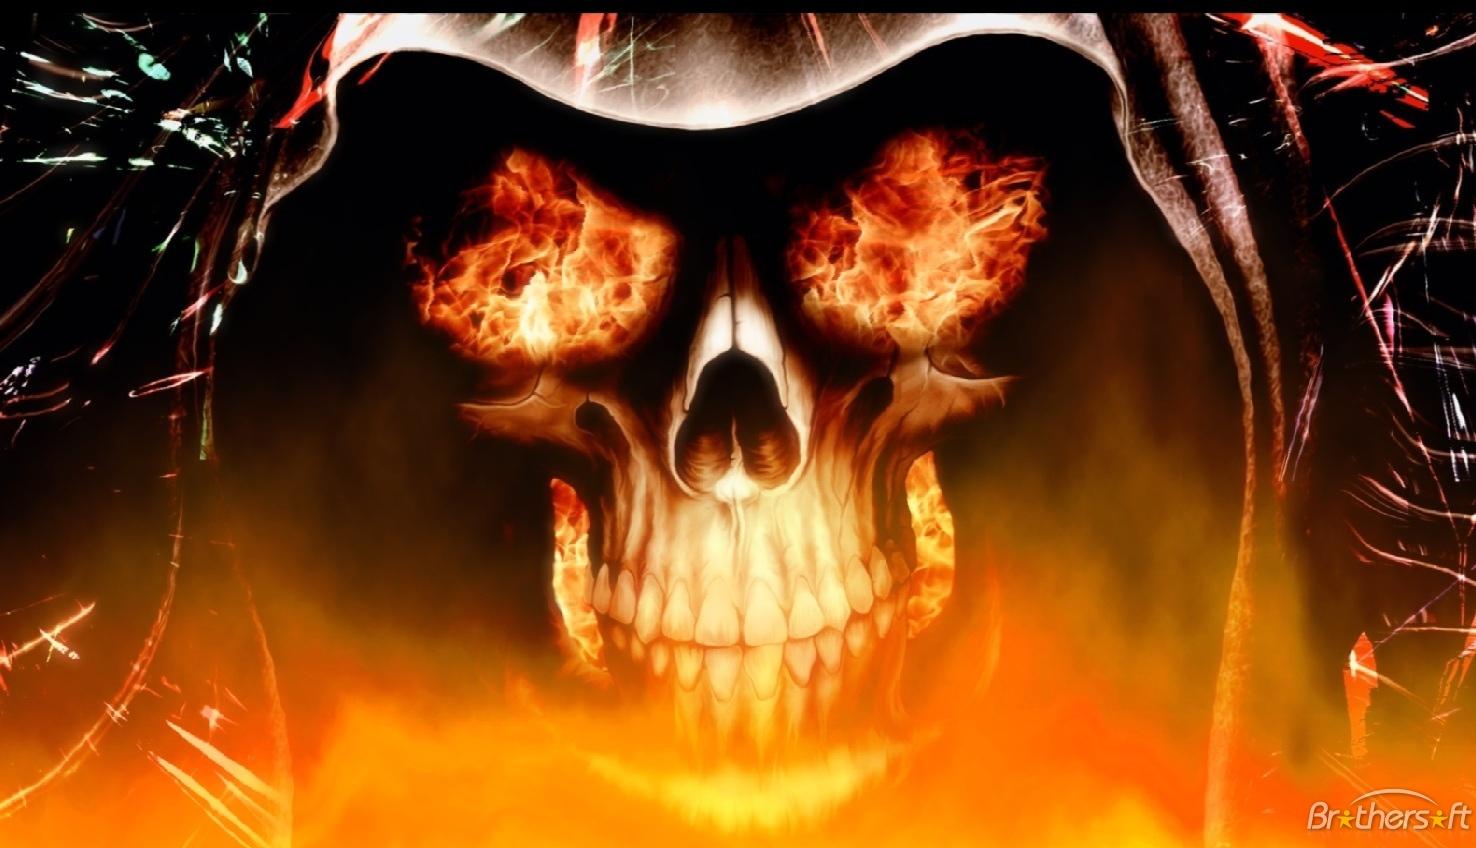 Skull Animated Wallpaper Fire Skull Animated Wallpaper 10 Download 1476x848